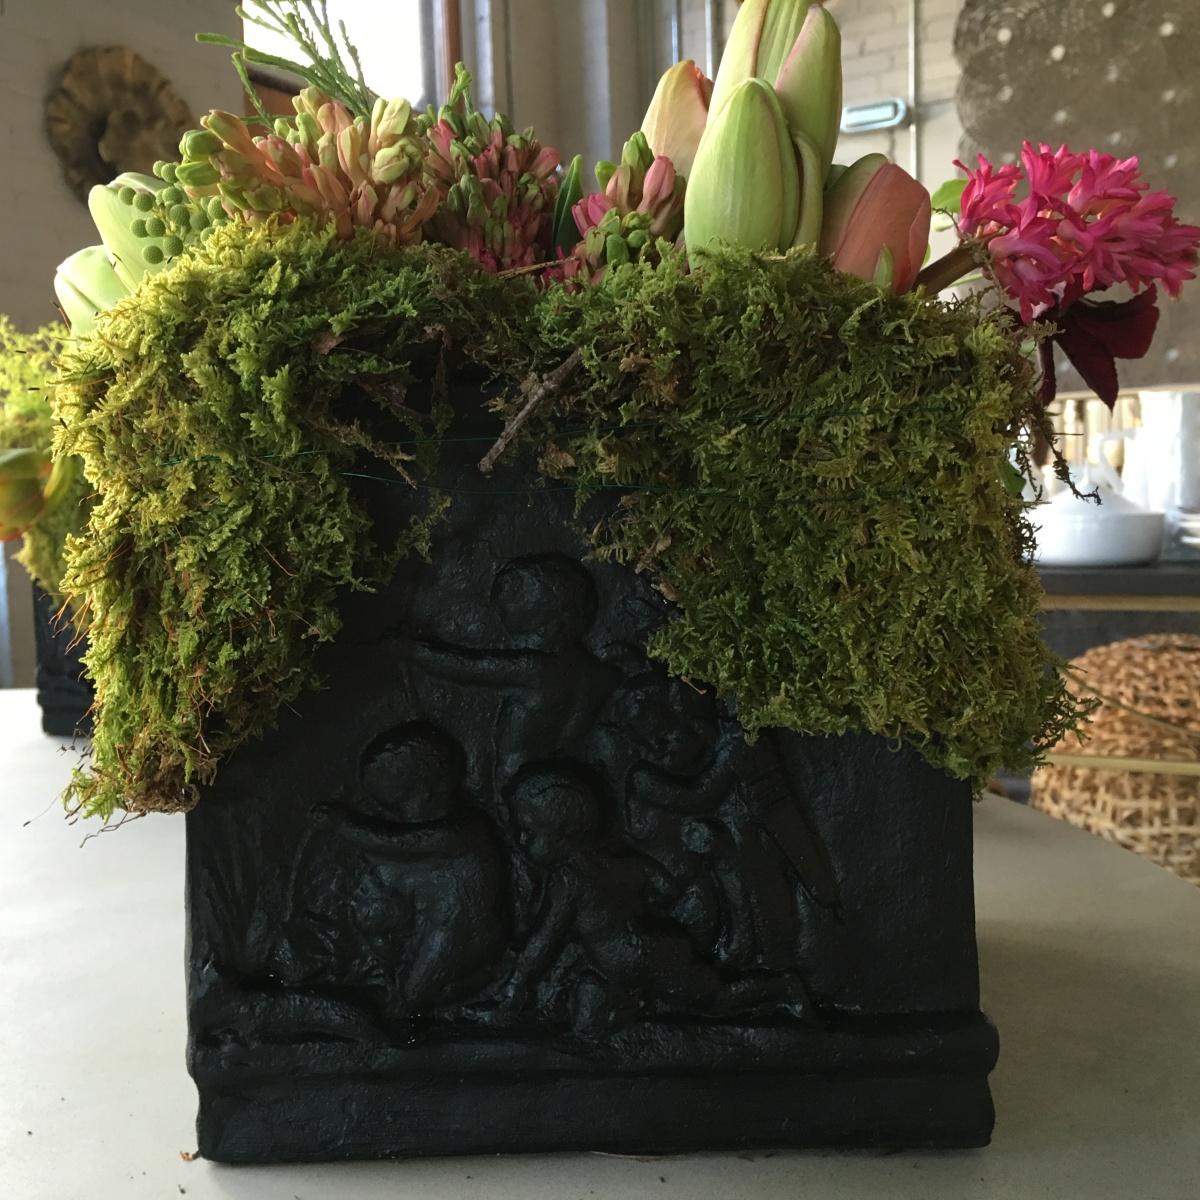 floral-cindye-spring-dinner-party-17